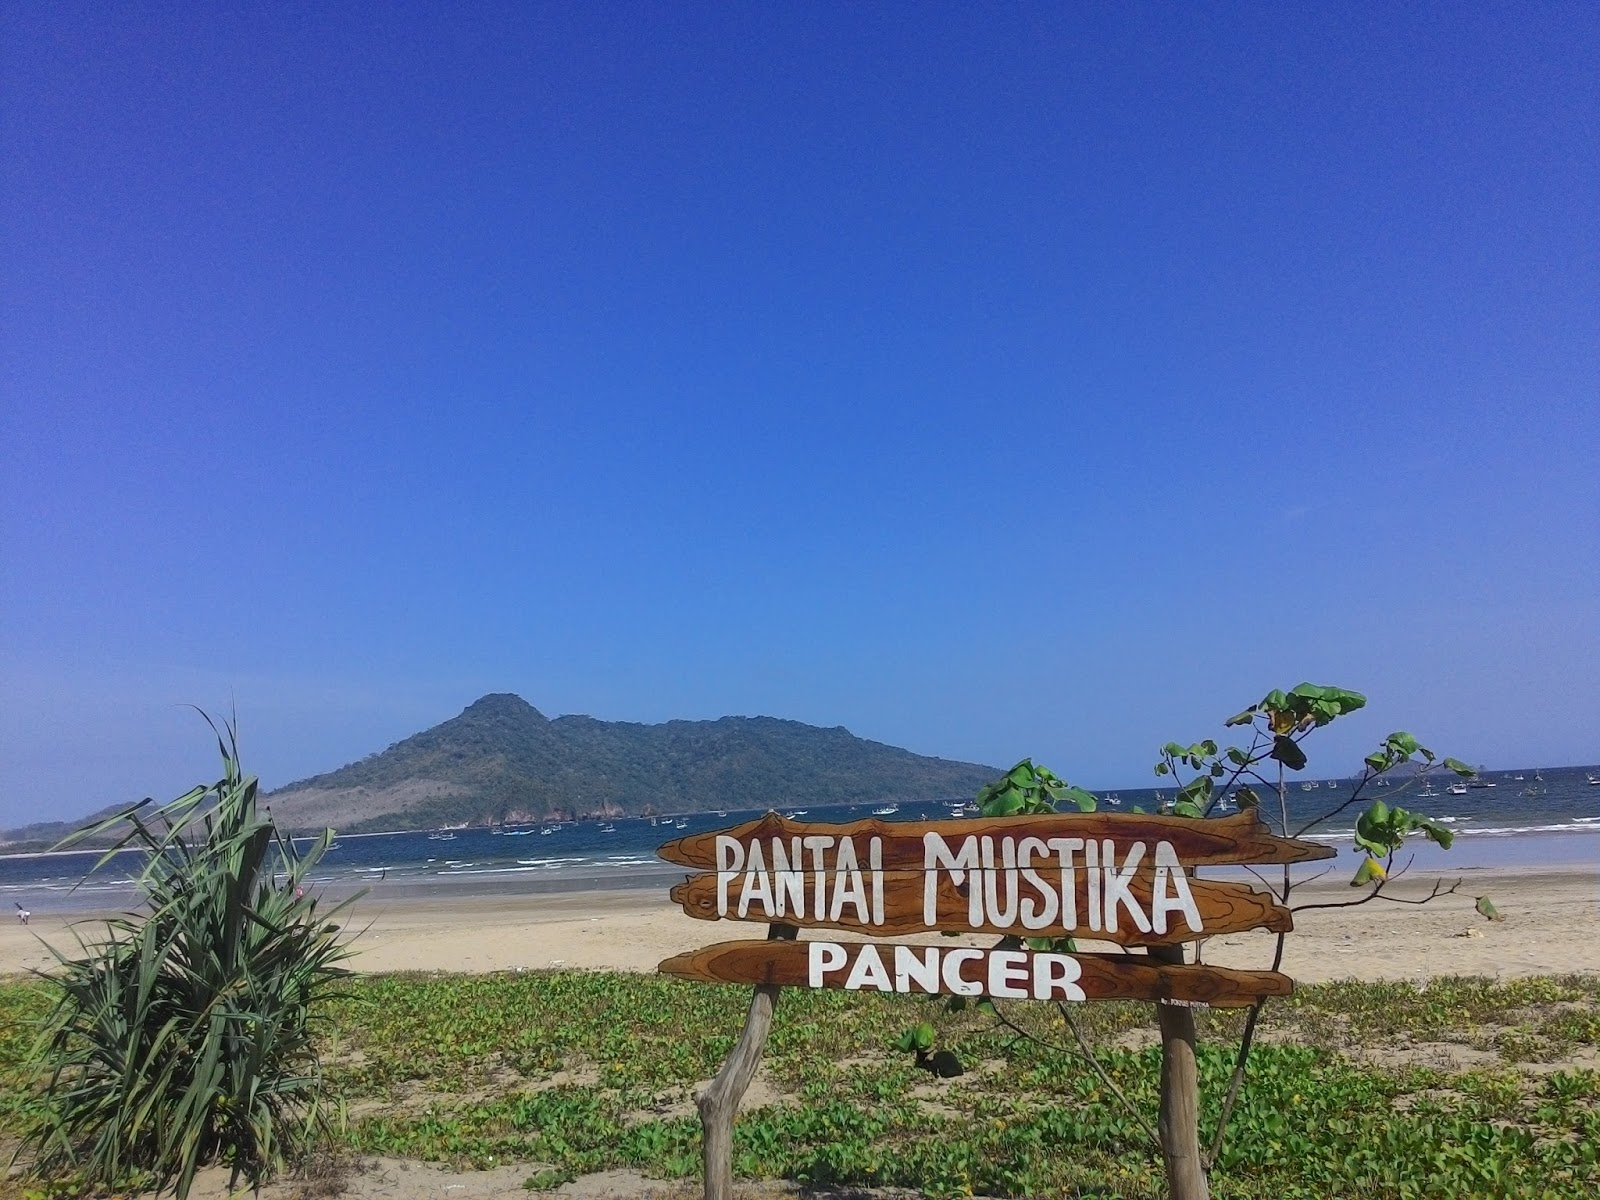 Wisata Banyuwangi Pantai Mustika Pancer Goophiee Selamat Pagi Pembaca Mengajak